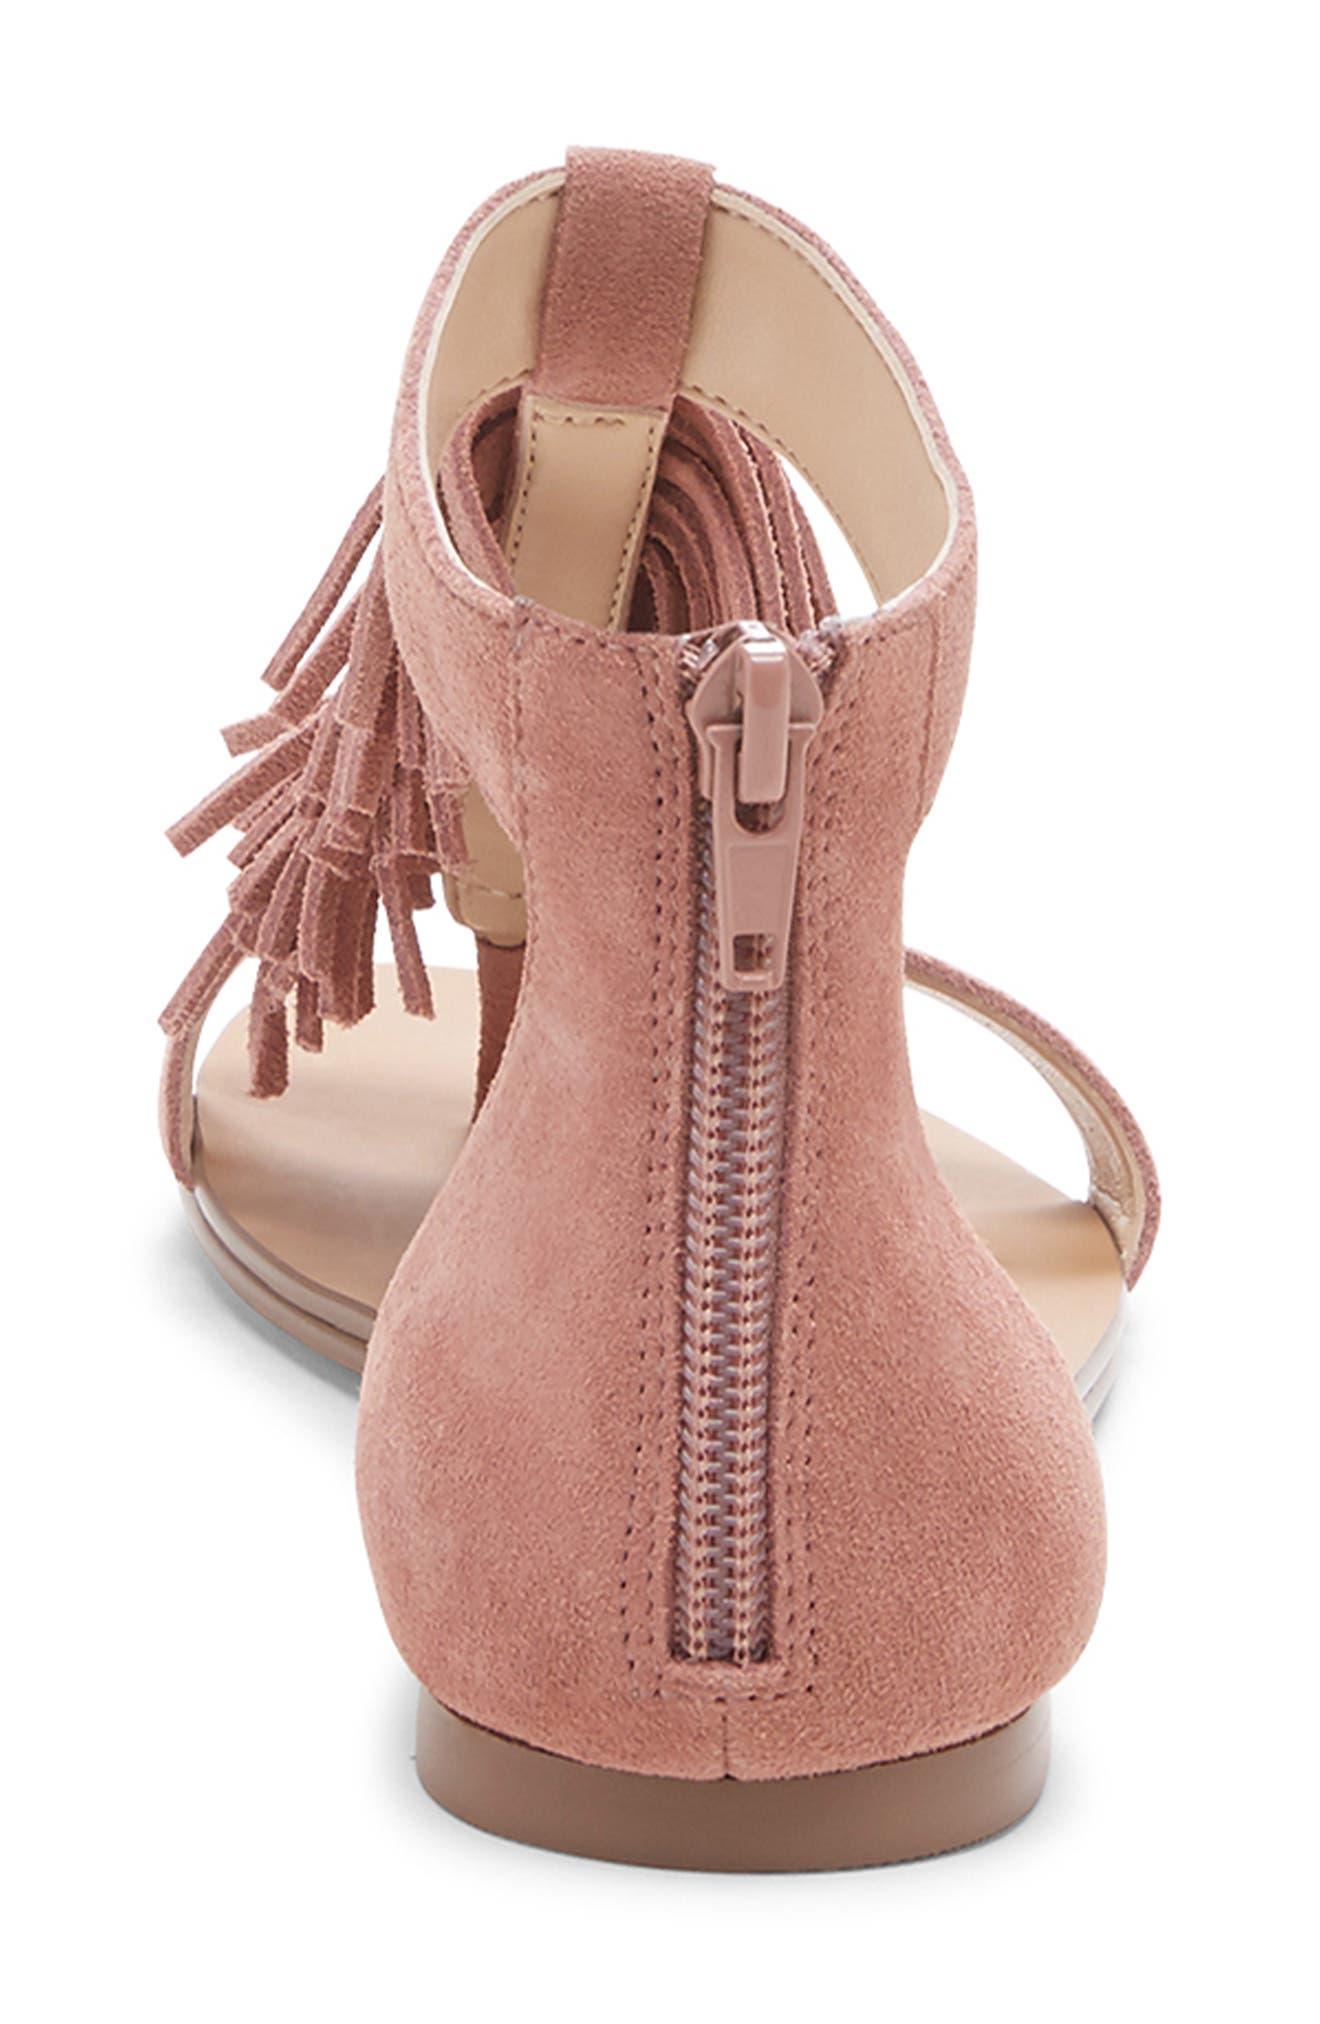 SOLE SOCIETY, 'Koa' Fringe T-Strap Flat Sandal, Alternate thumbnail 7, color, MOD MAUVE SUEDE